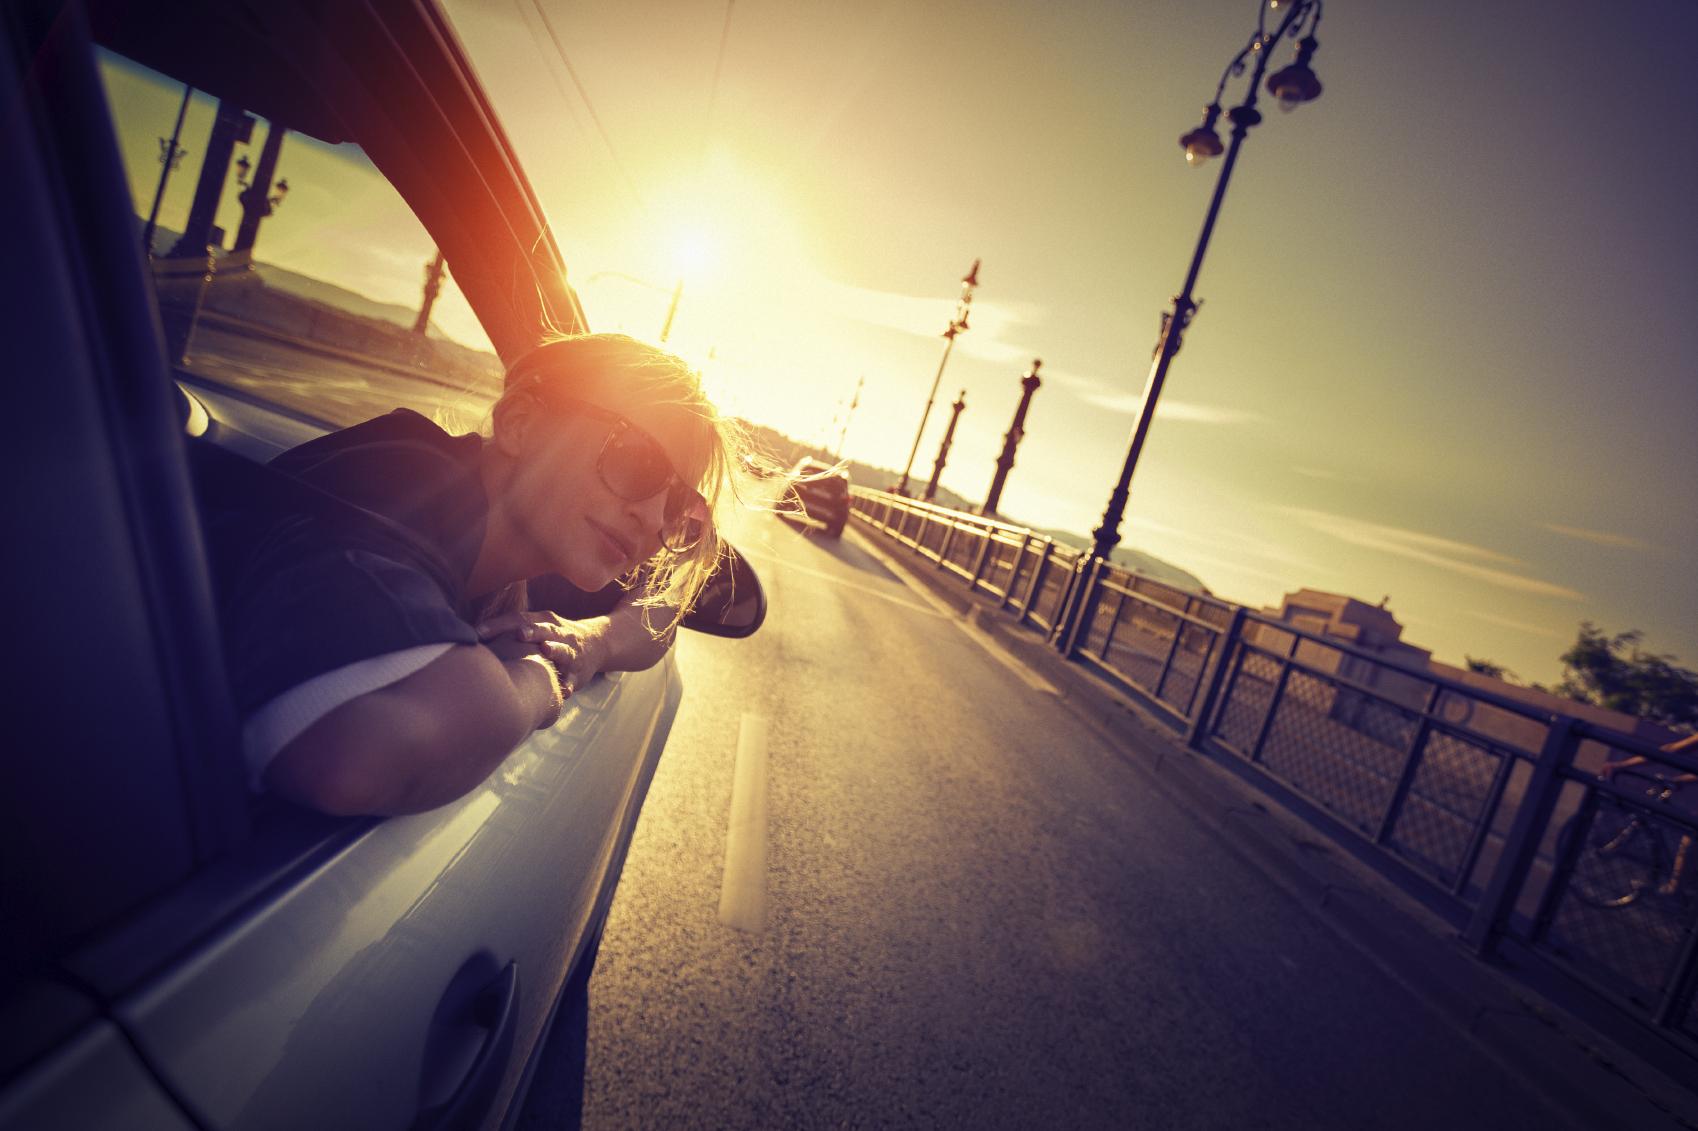 speeding-into-the-sunset-000044694716_Medium